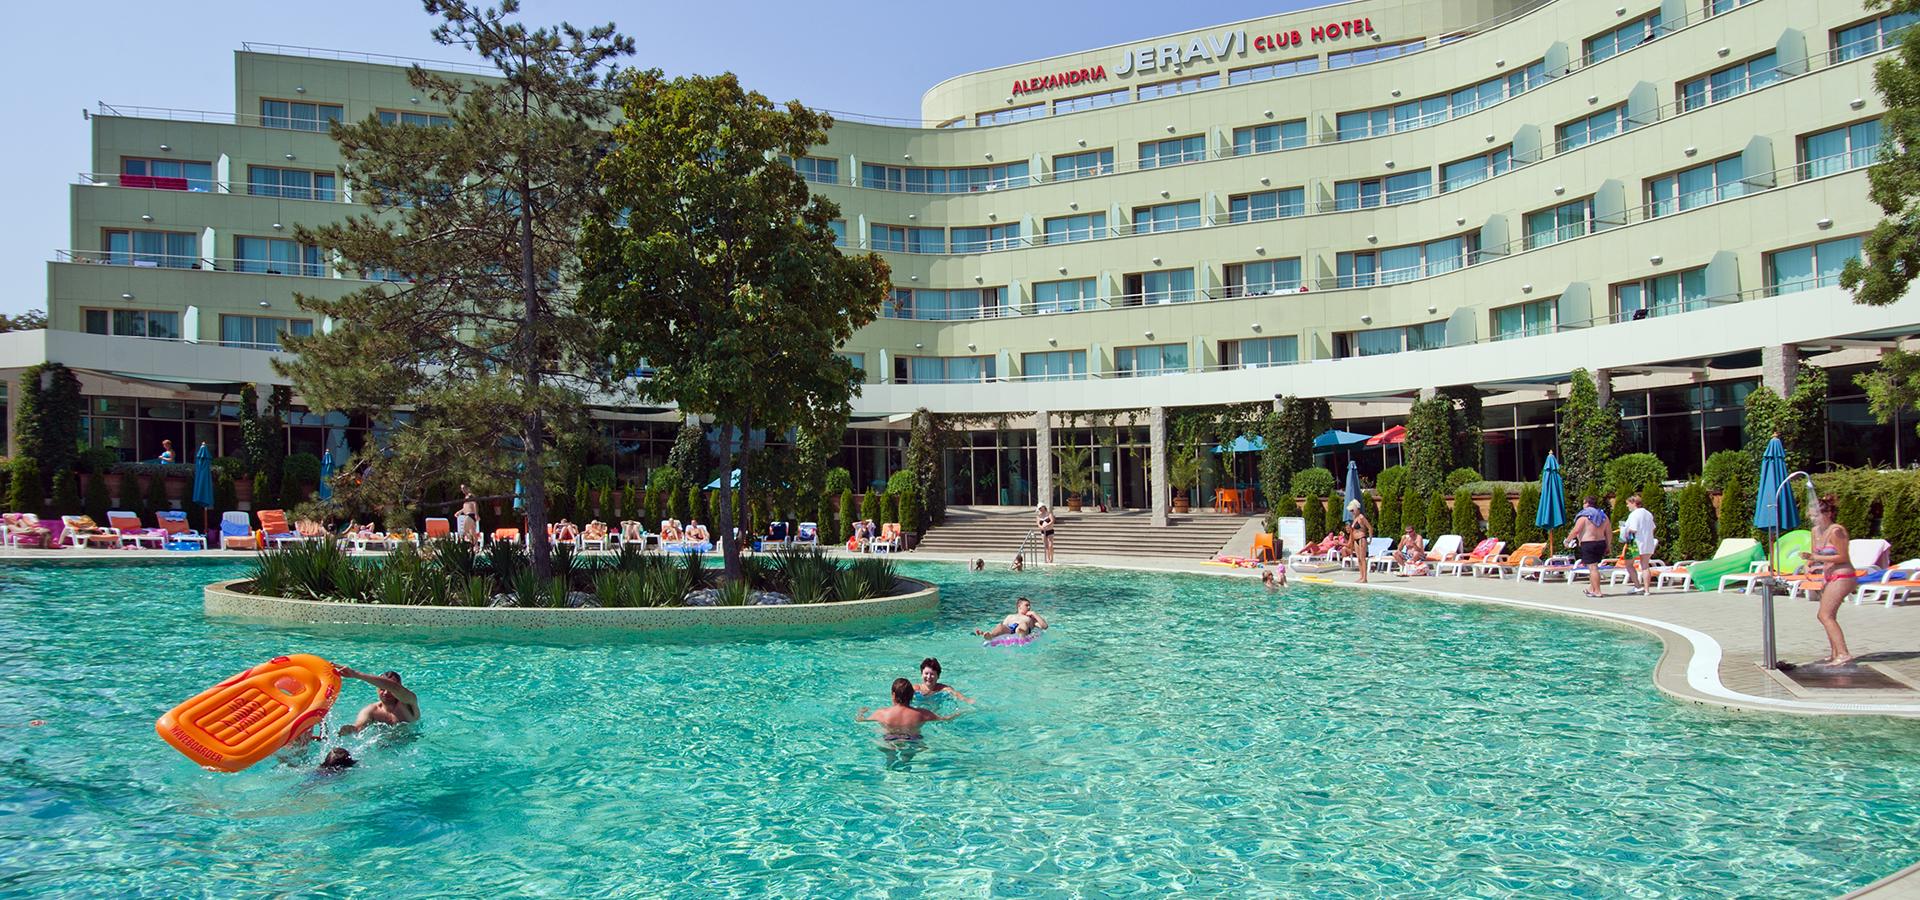 Jeravi Alexandria Club Hotels